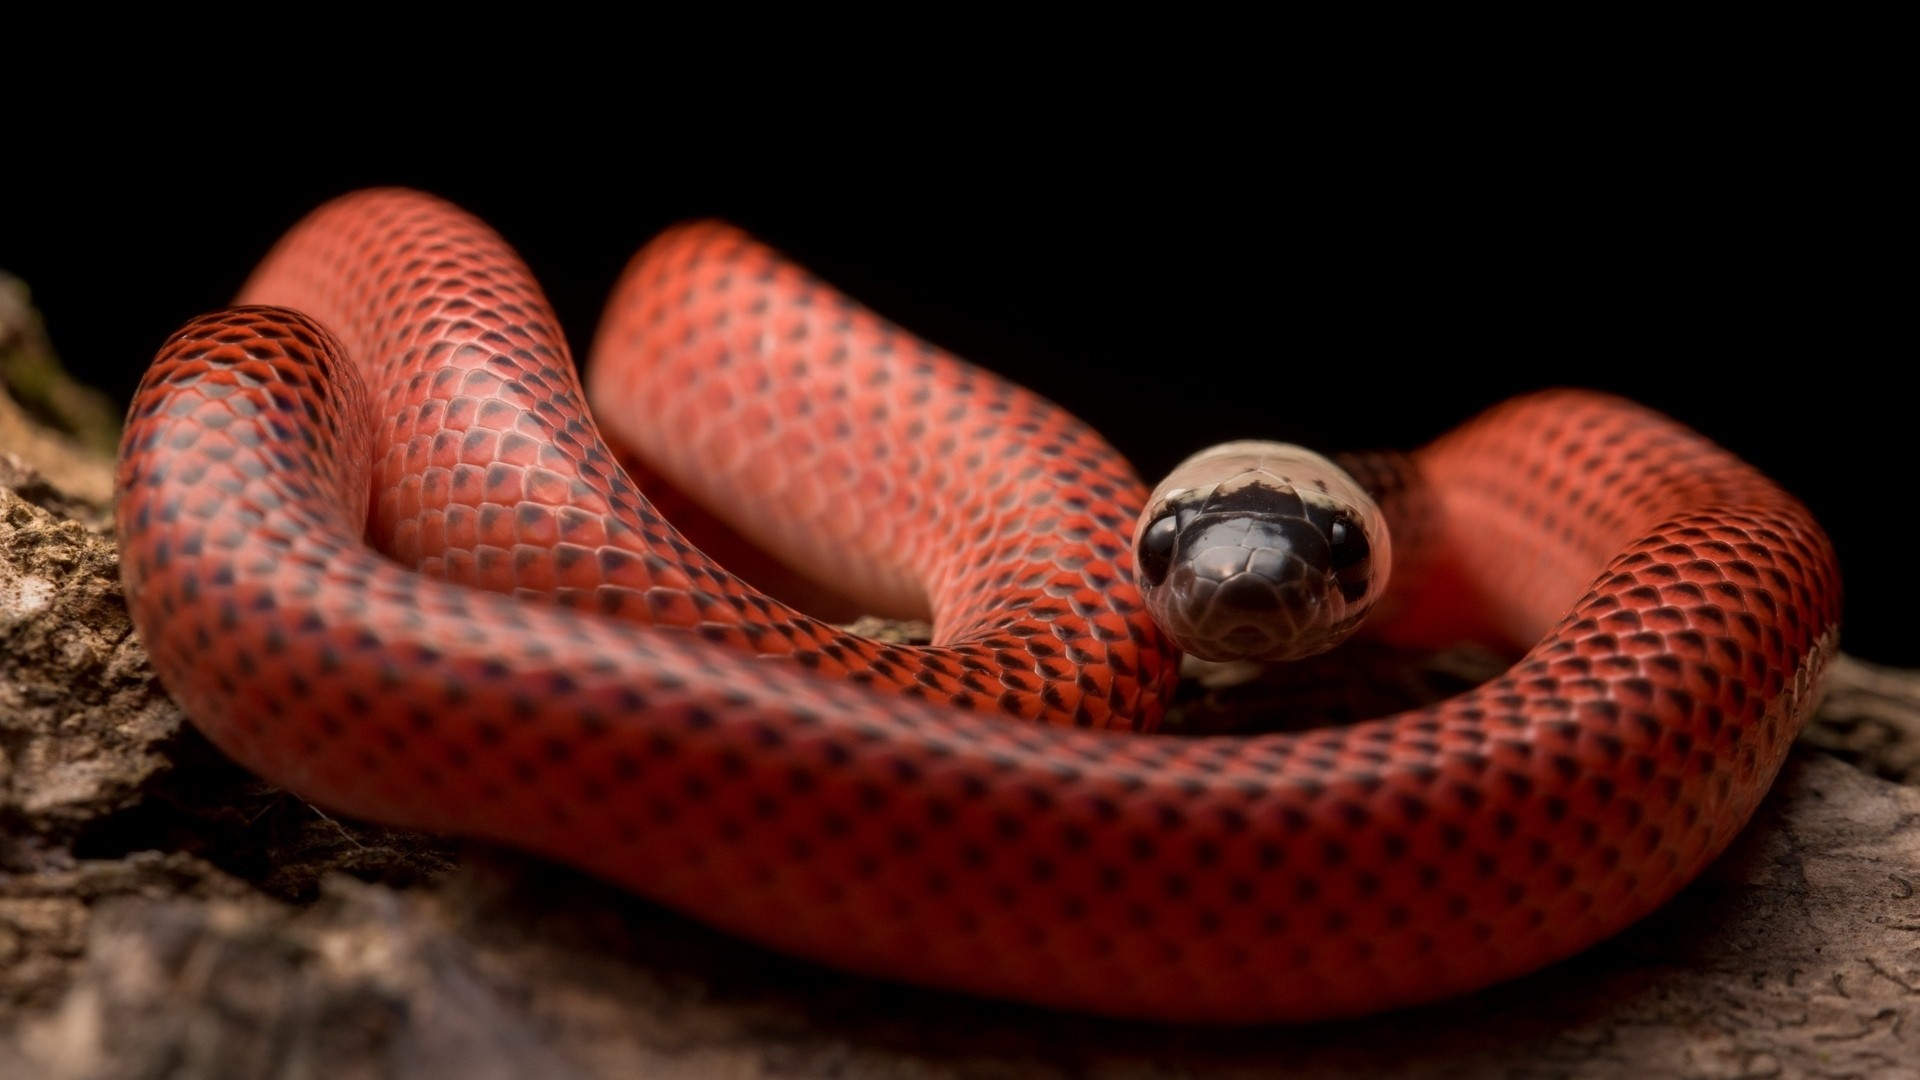 Snake HD Wallpaper